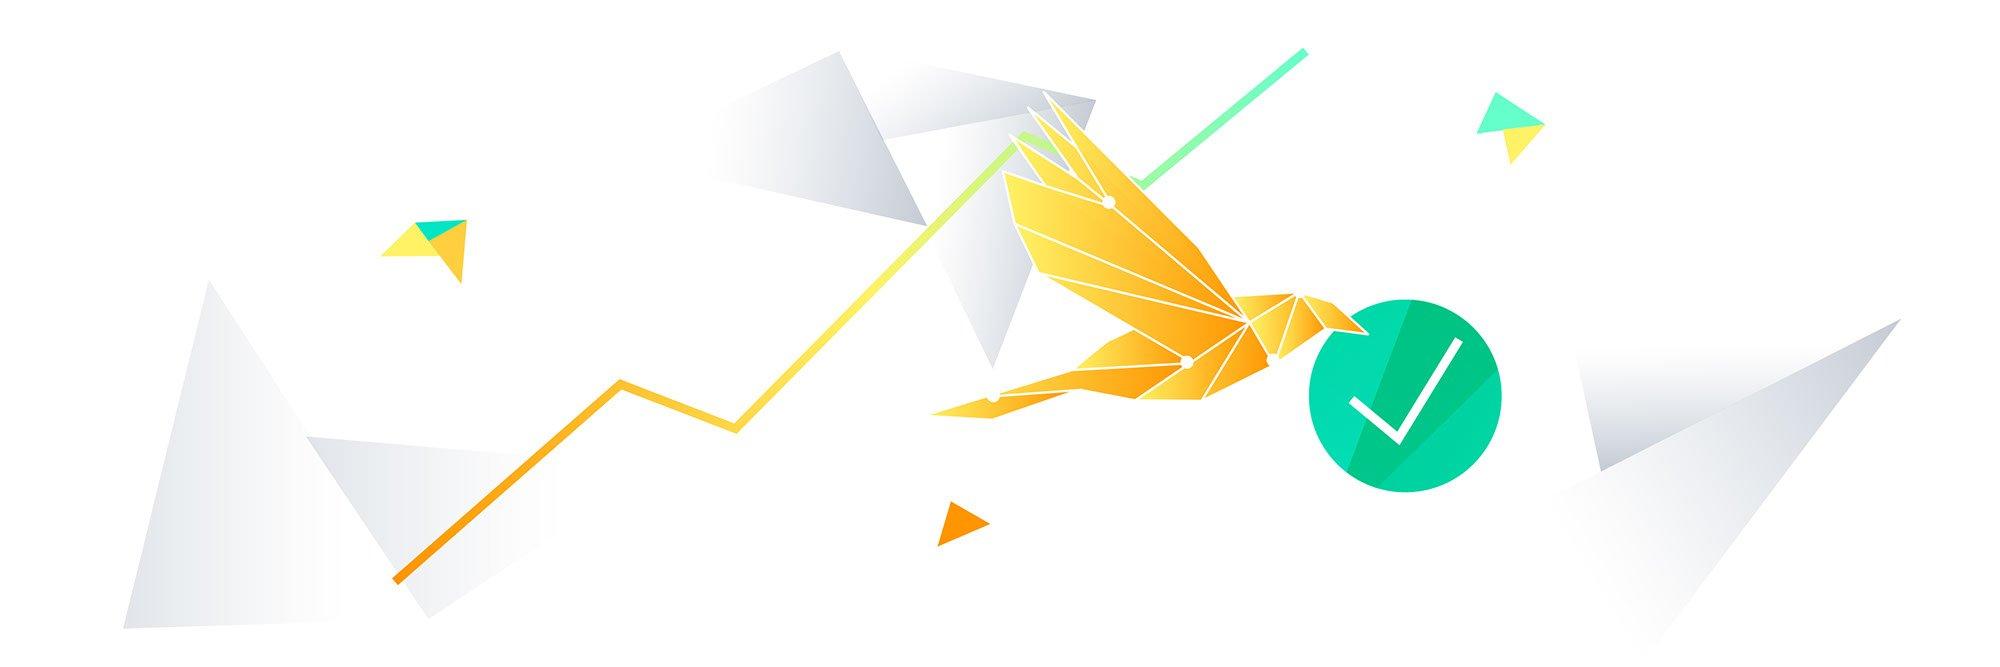 [DIAGRAM] Corvus vCISO: Your Clients' New (Virtual) Cybersecurity Pro